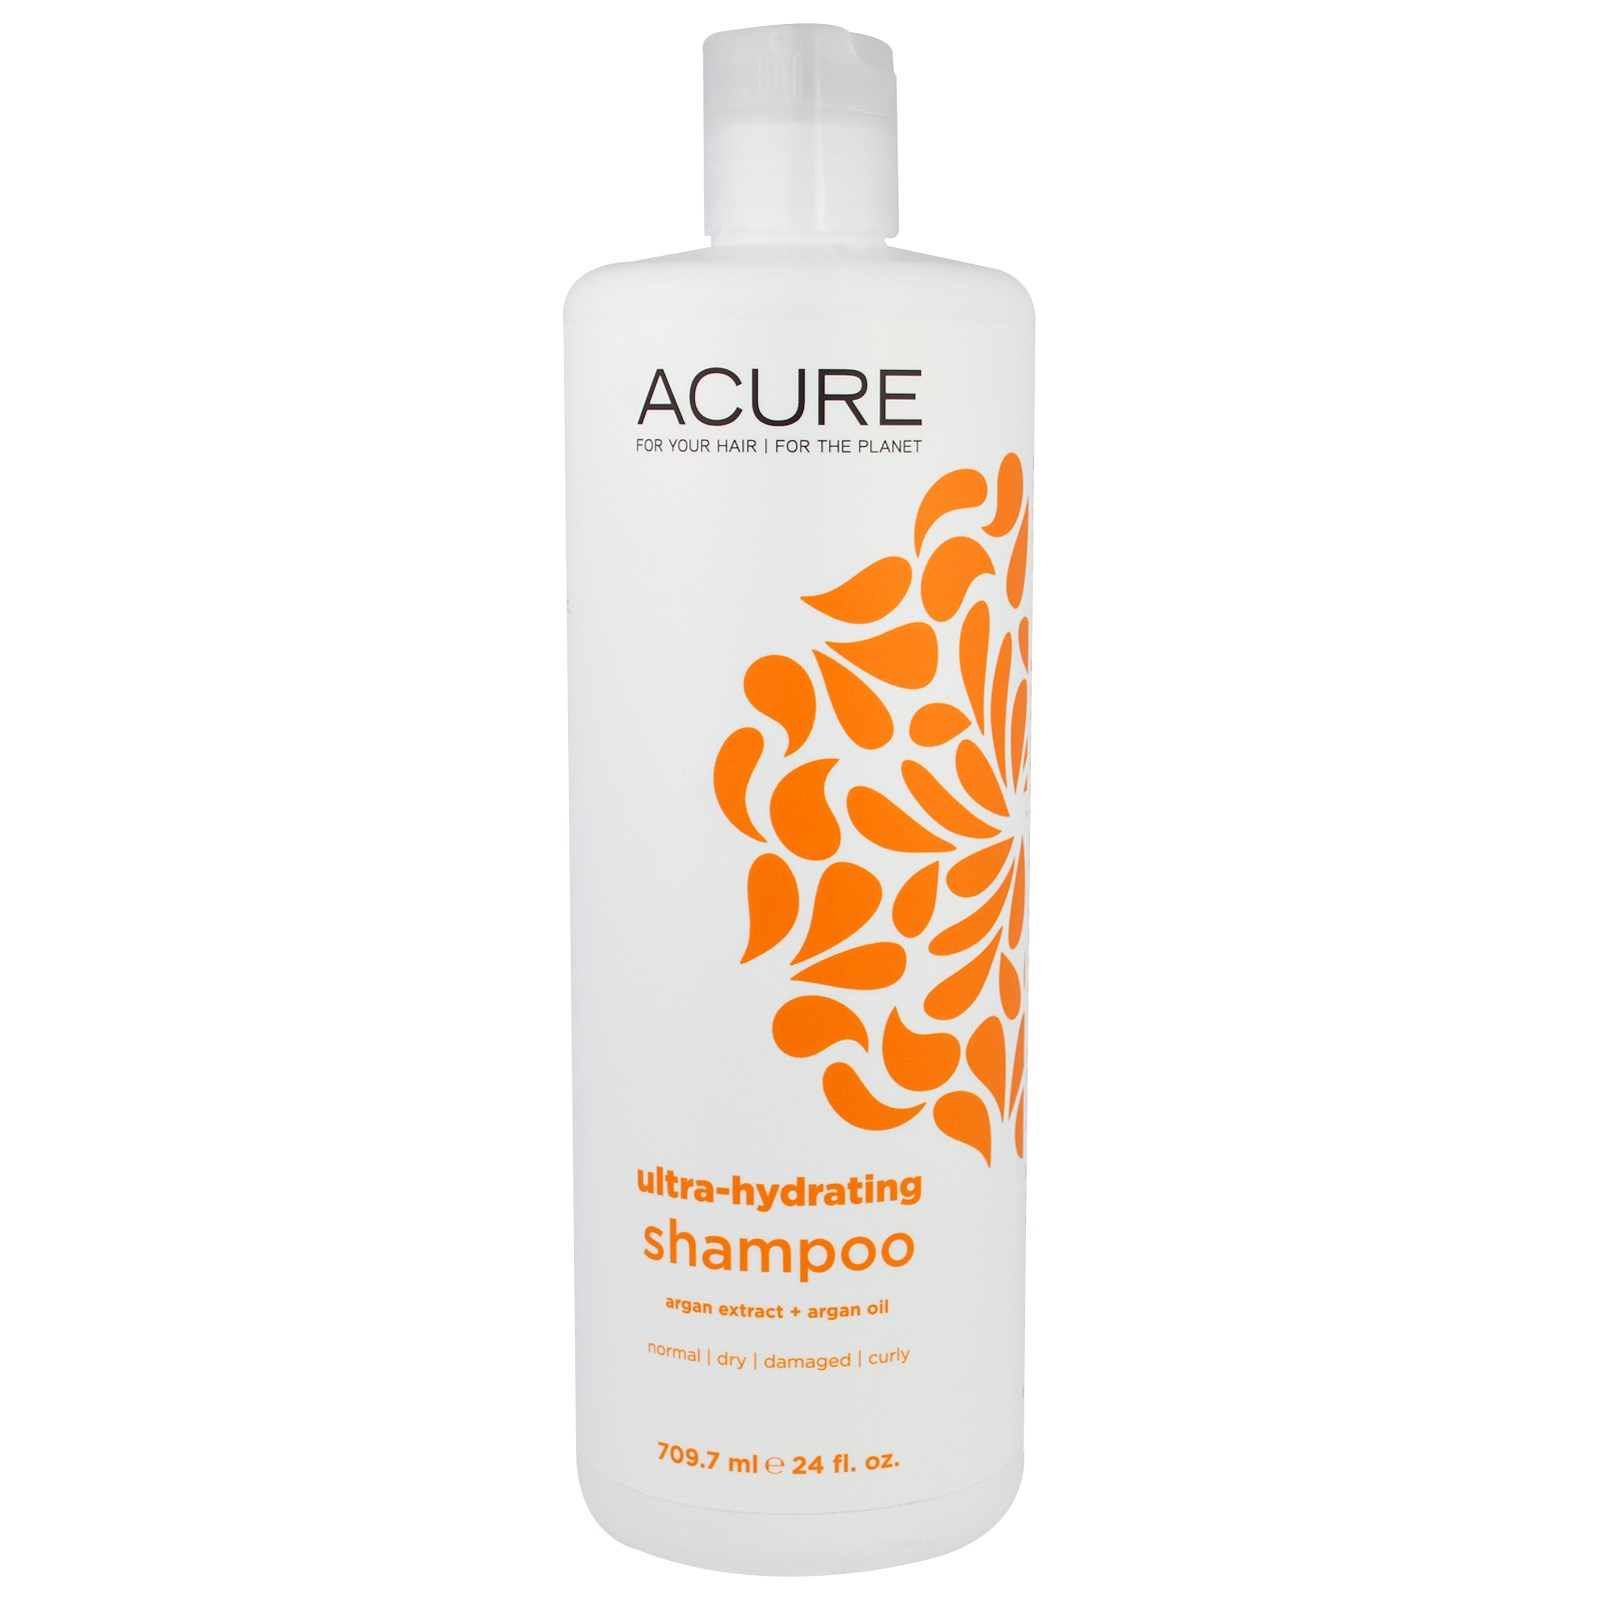 Acure, Shampoo, Ultra-Hydrating, Argan Extract + Argan Oil